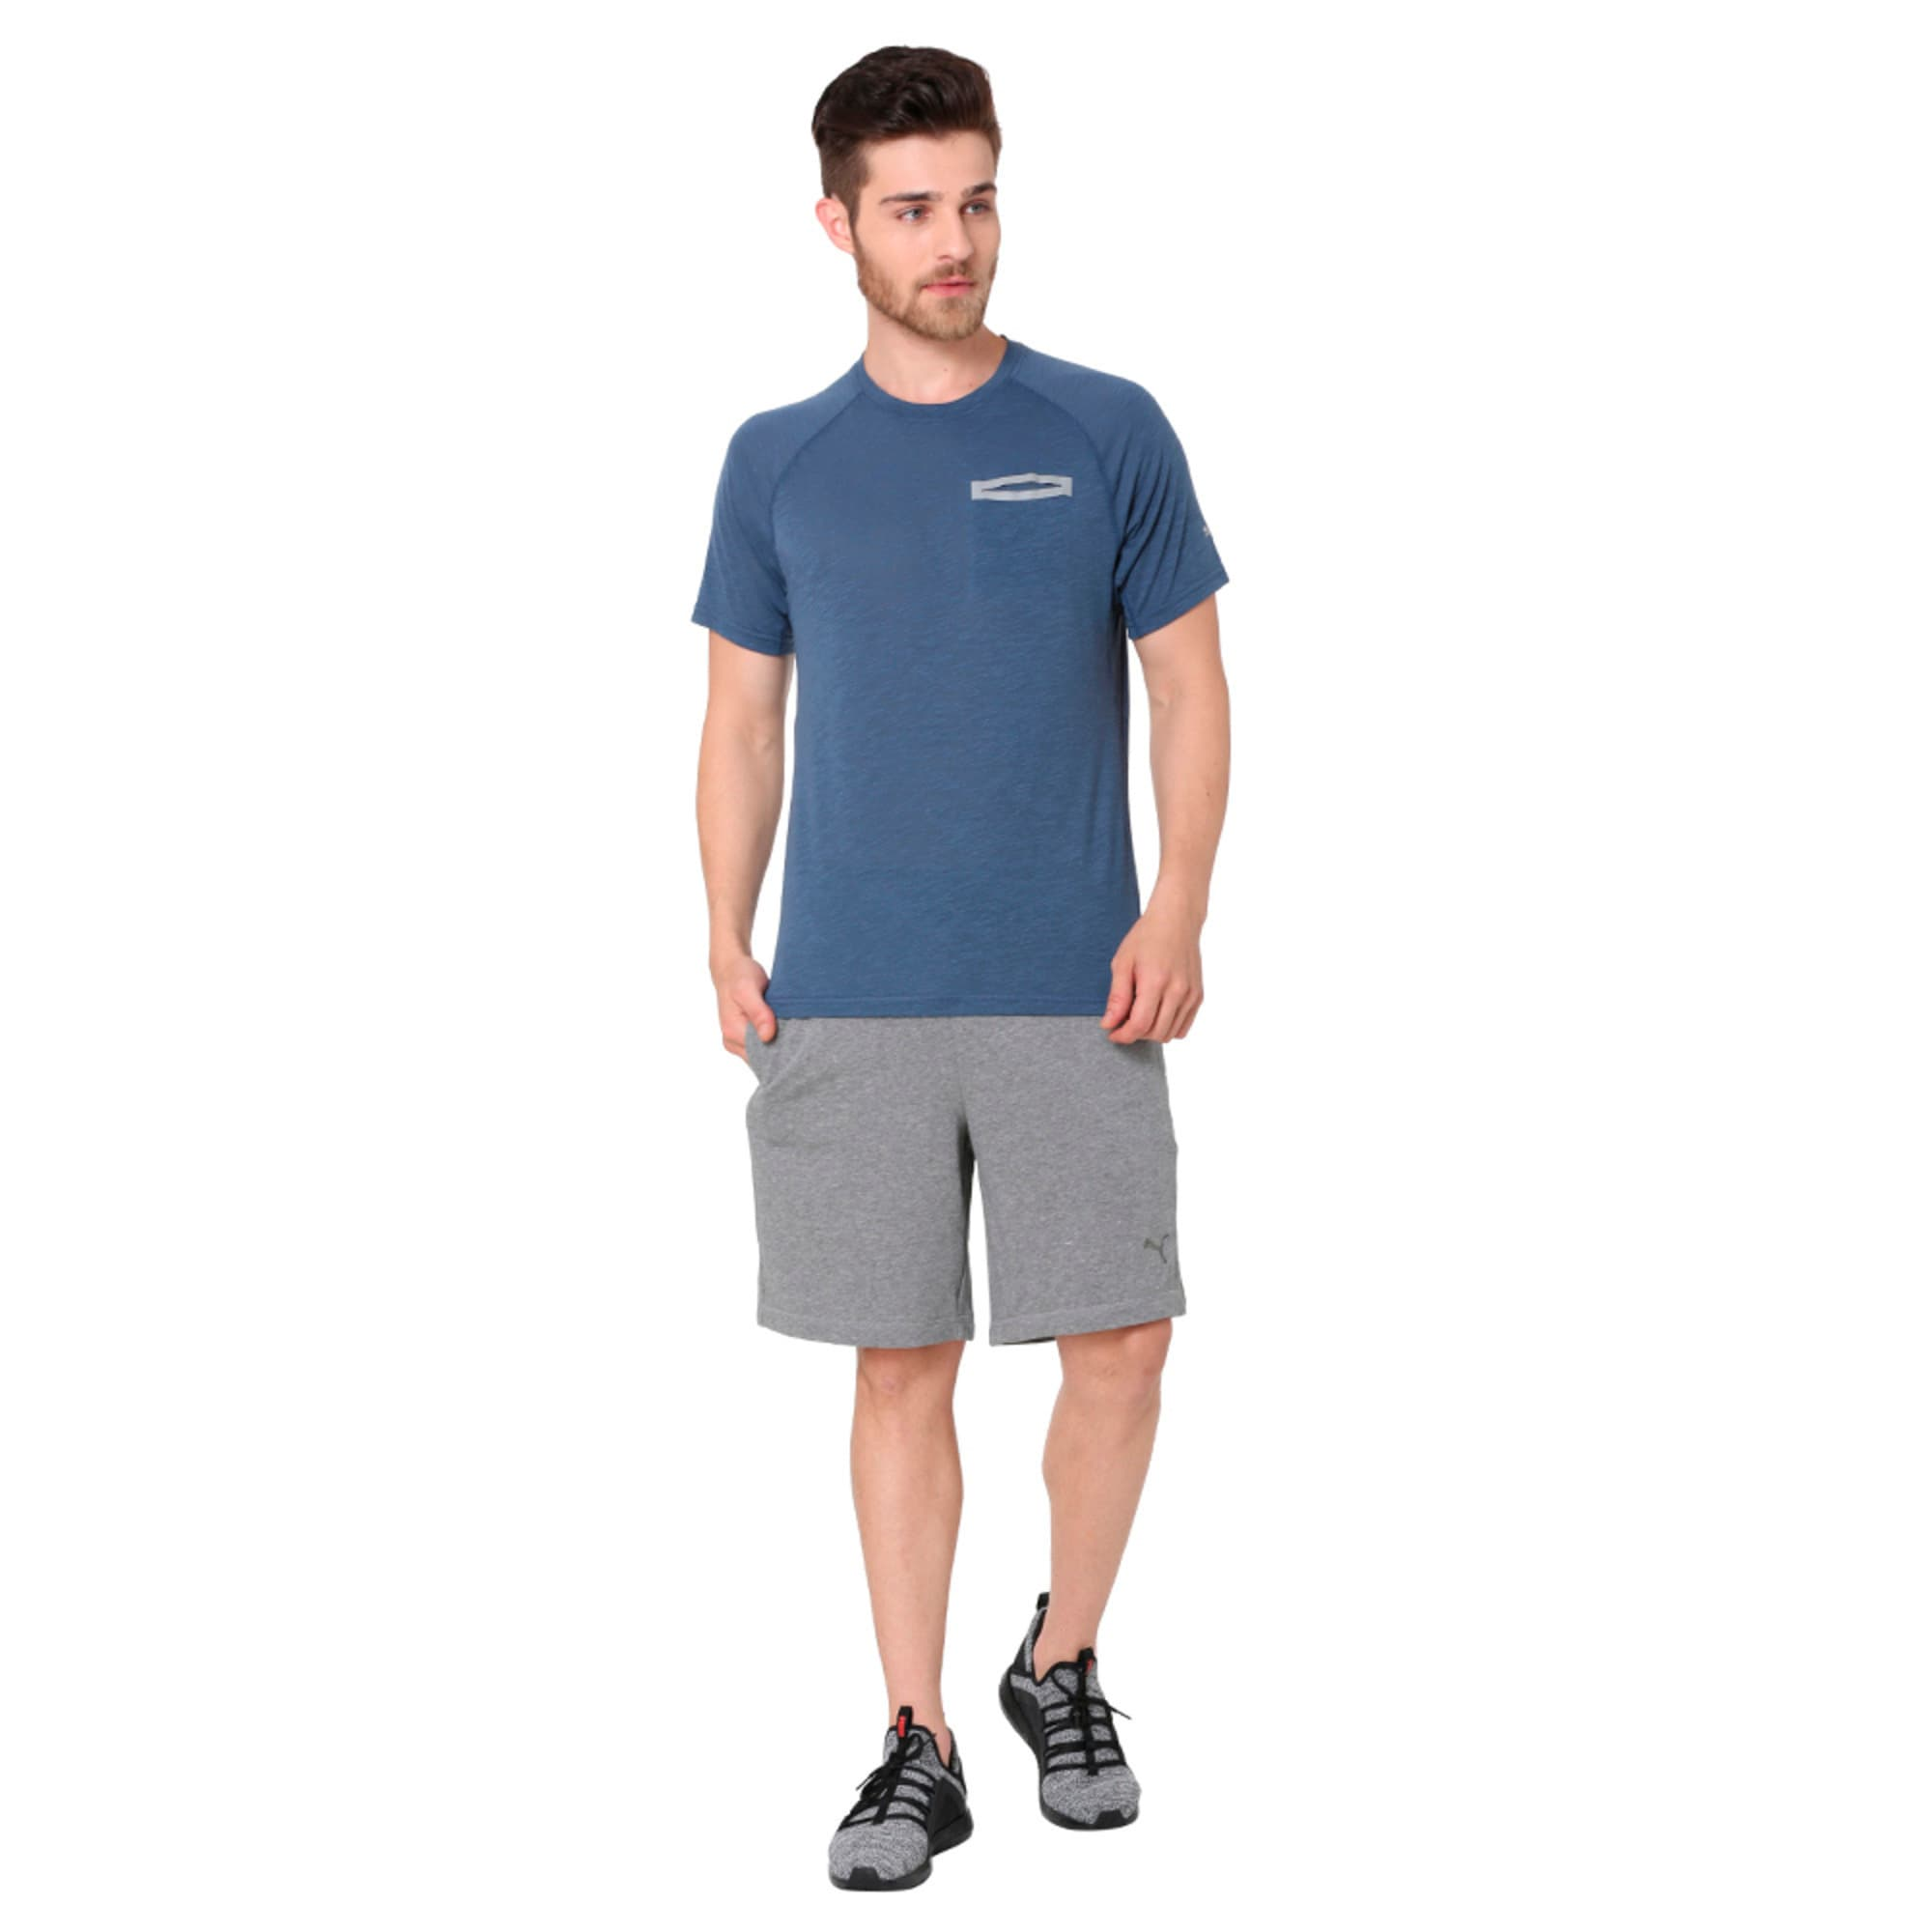 Thumbnail 2 of Energy Short Sleeve Men's Running T-Shirt, Sargasso Sea Heather, medium-IND